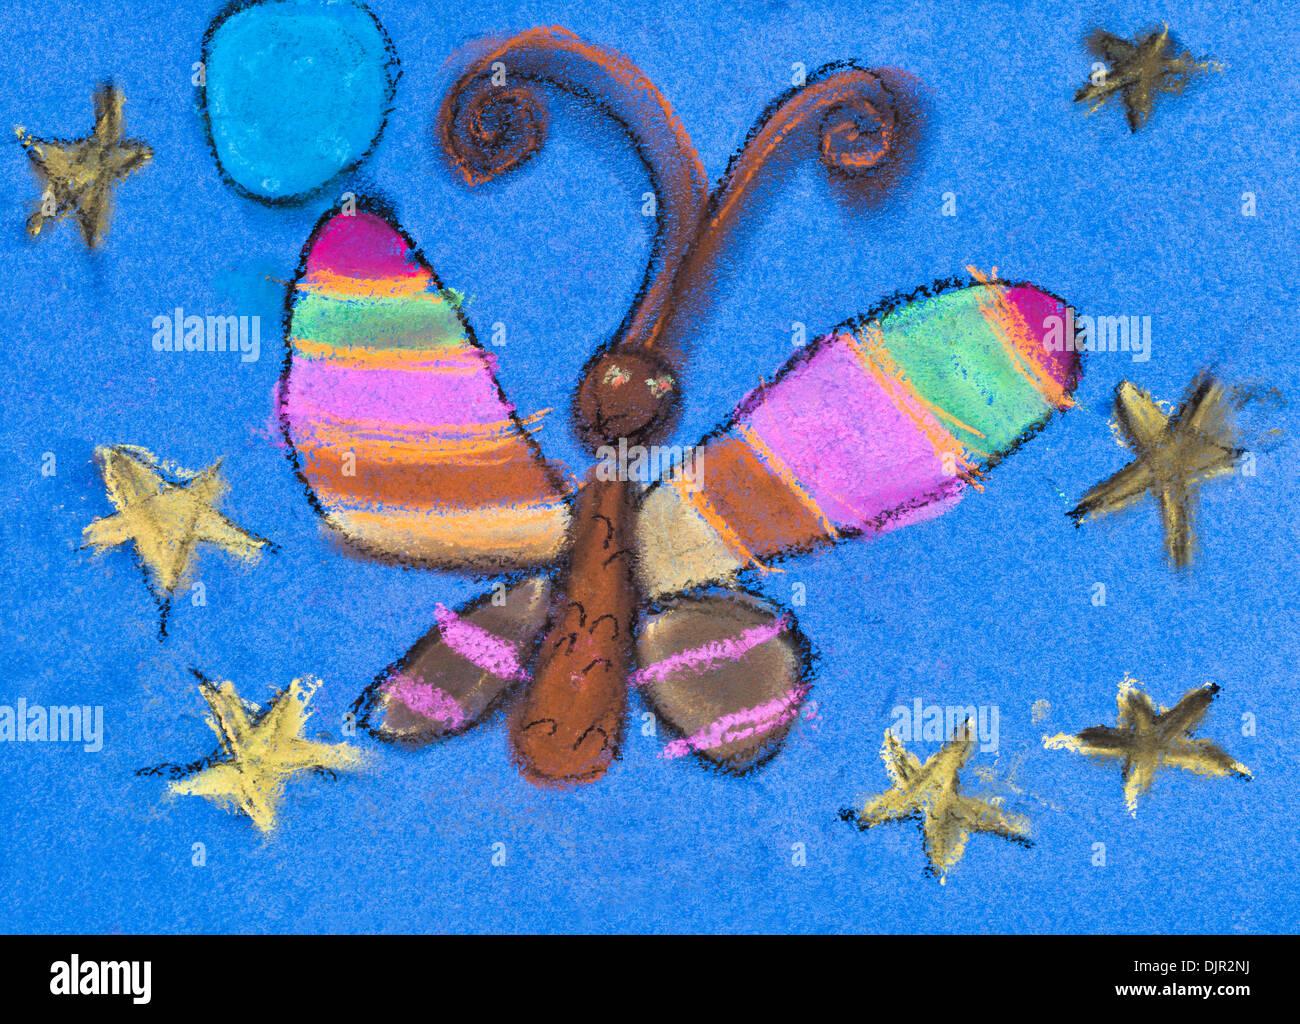 children drawing - night moth under blue star sky - Stock Image